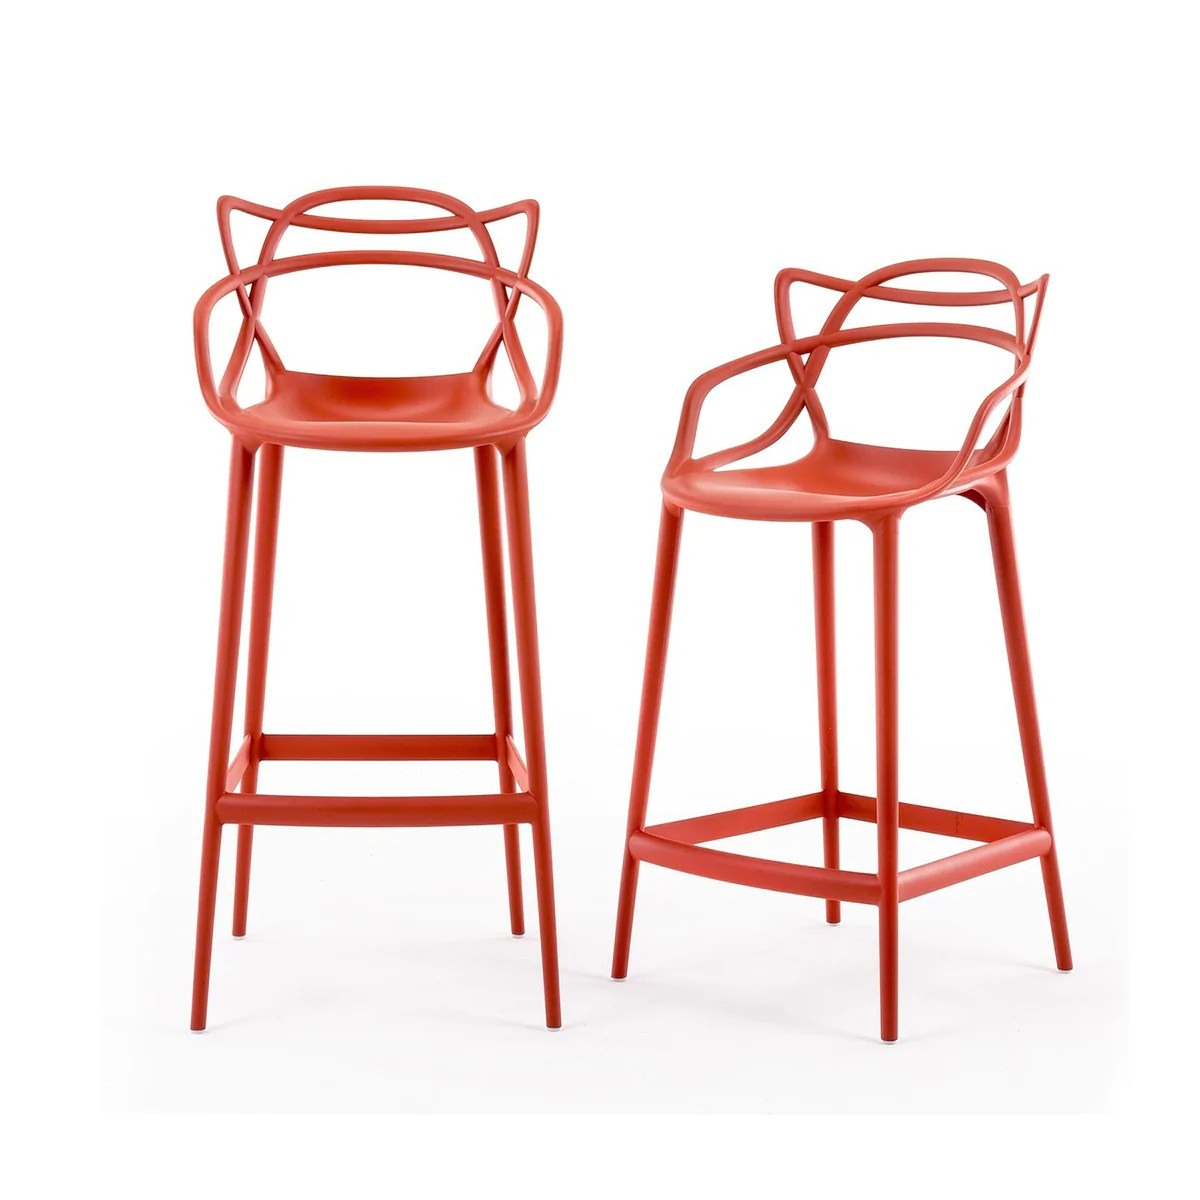 Kartell Masters Stool 大師 高腳椅 - Luxury Life 傢具, 燈飾 & 生活配件